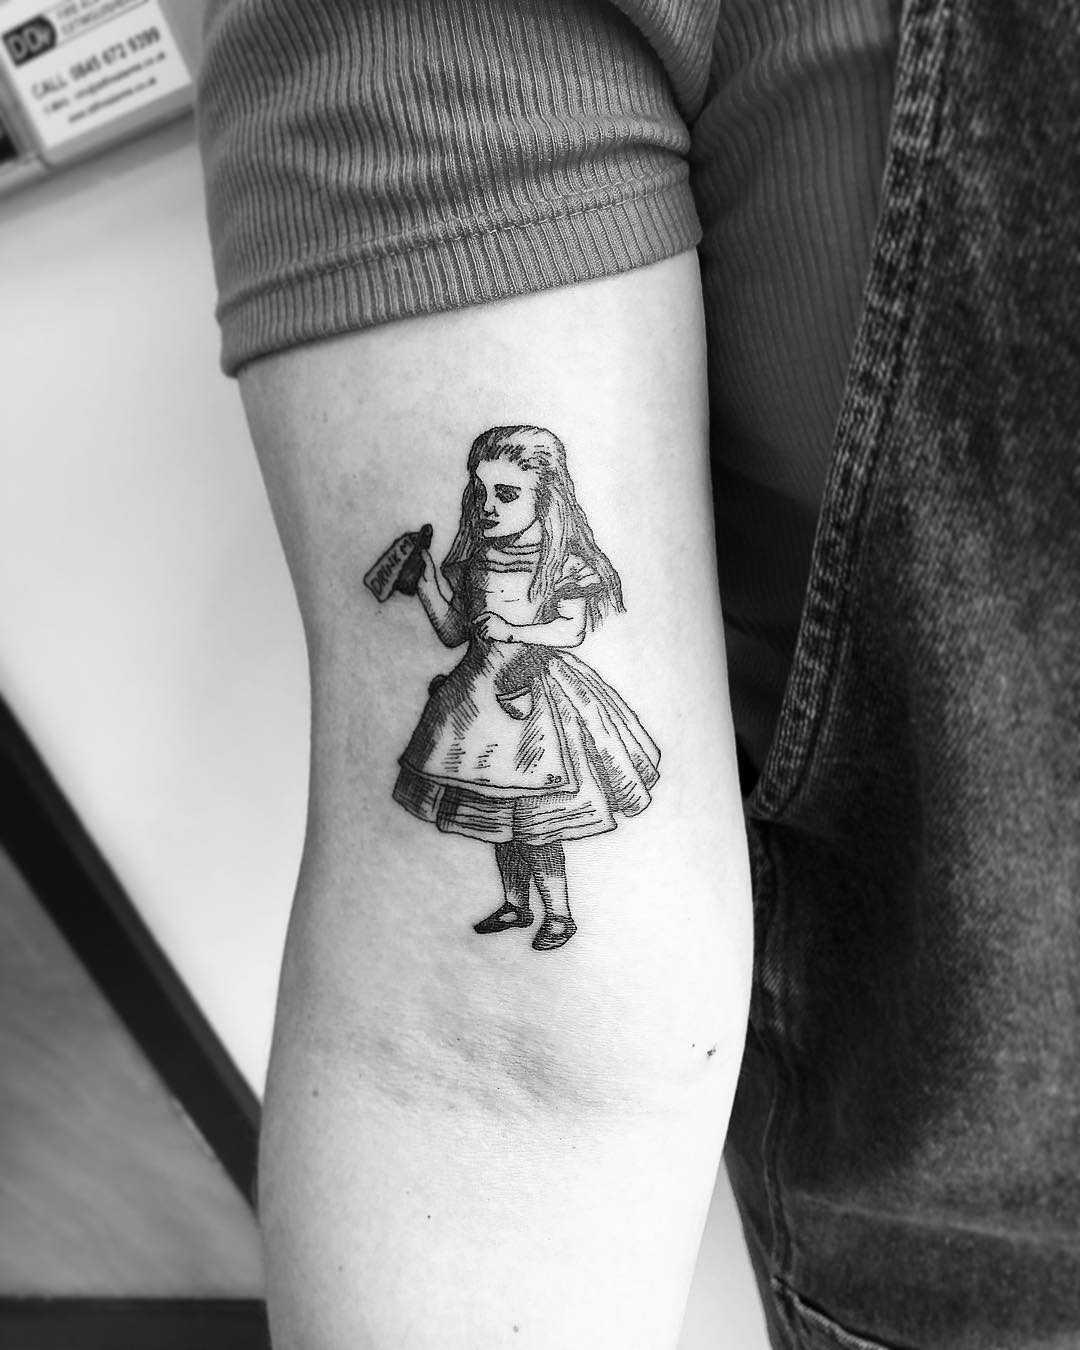 Vintage Alice In Wonderland illustration by Jake Harry Ditchfield